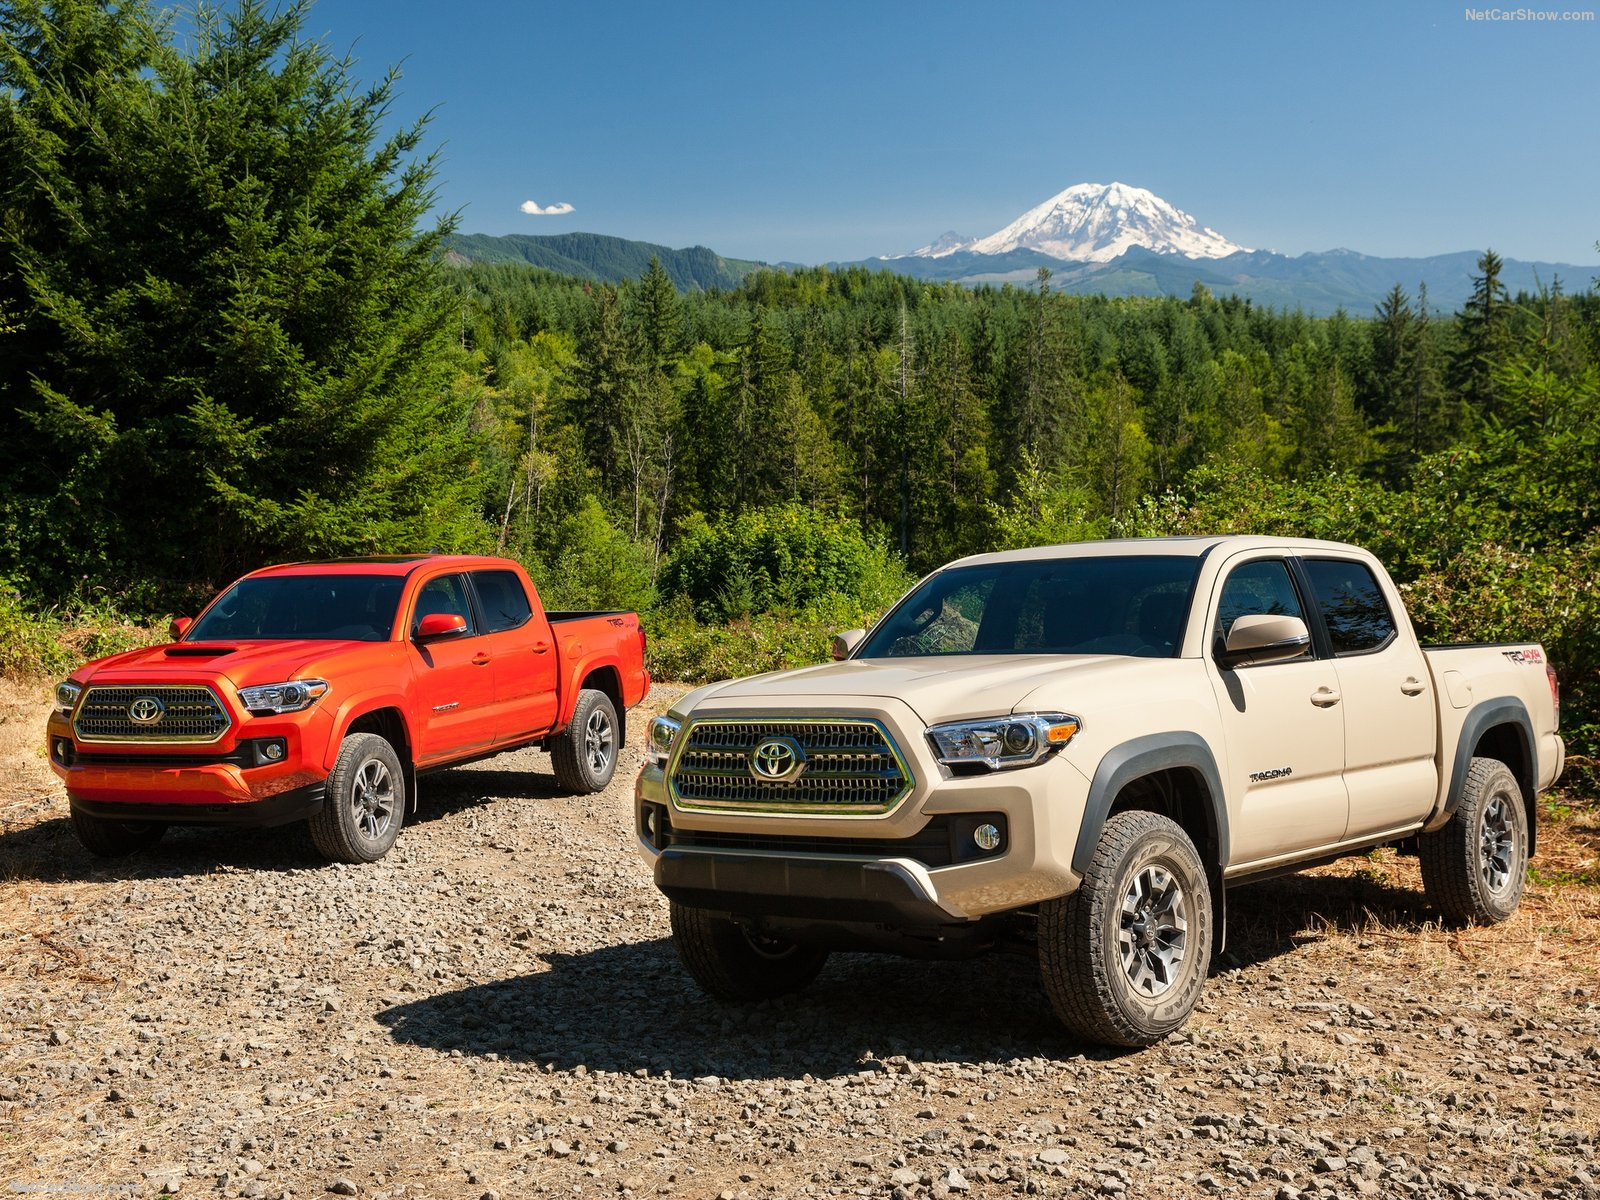 Đánh giá Toyota Tacoma 2016 & giá xe